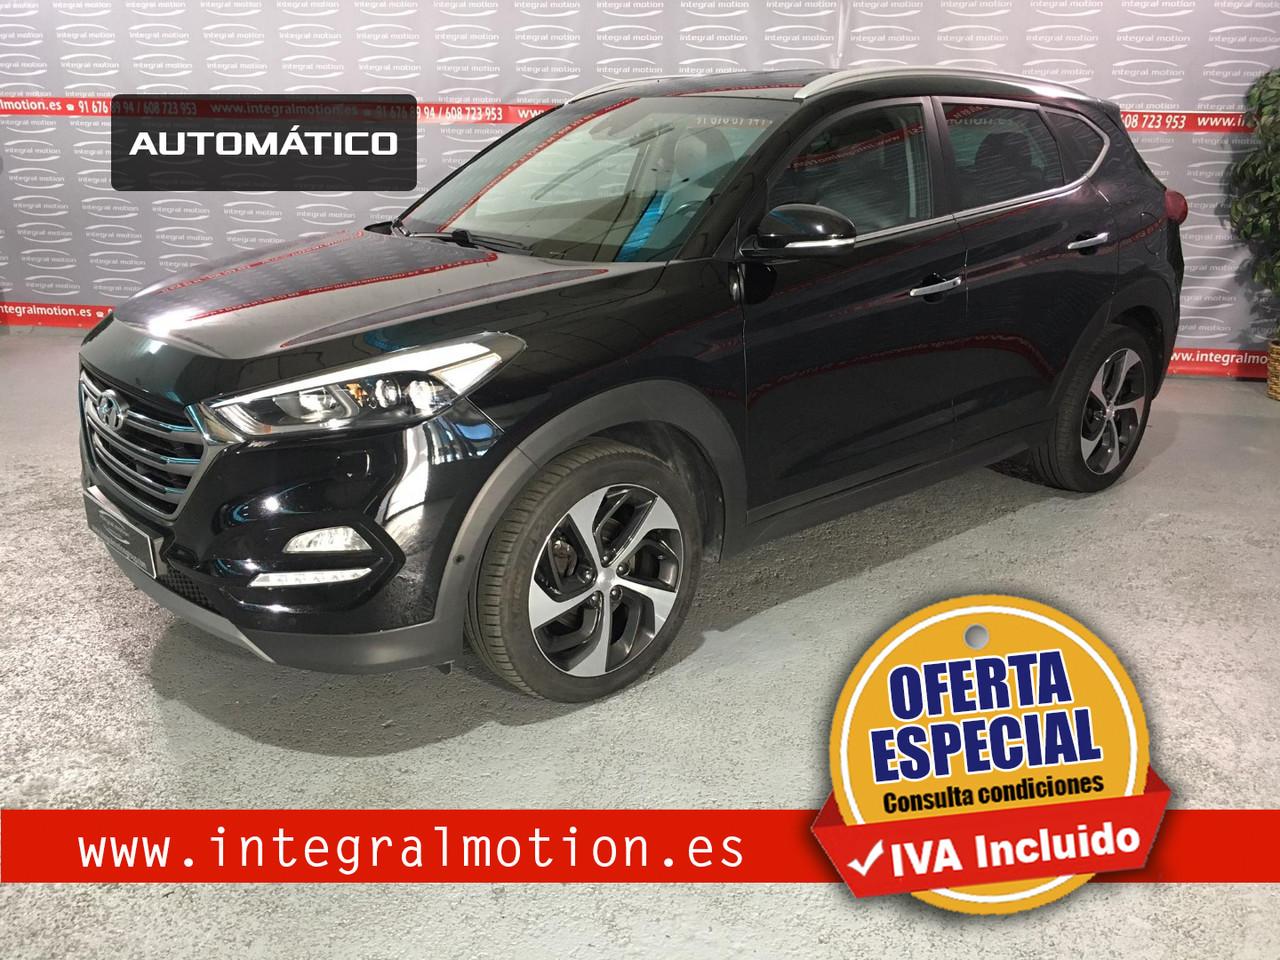 Hyundai Tucson 1.7 CRDi 104kW (141CV) BD Style DCT 4x2  - Foto 1